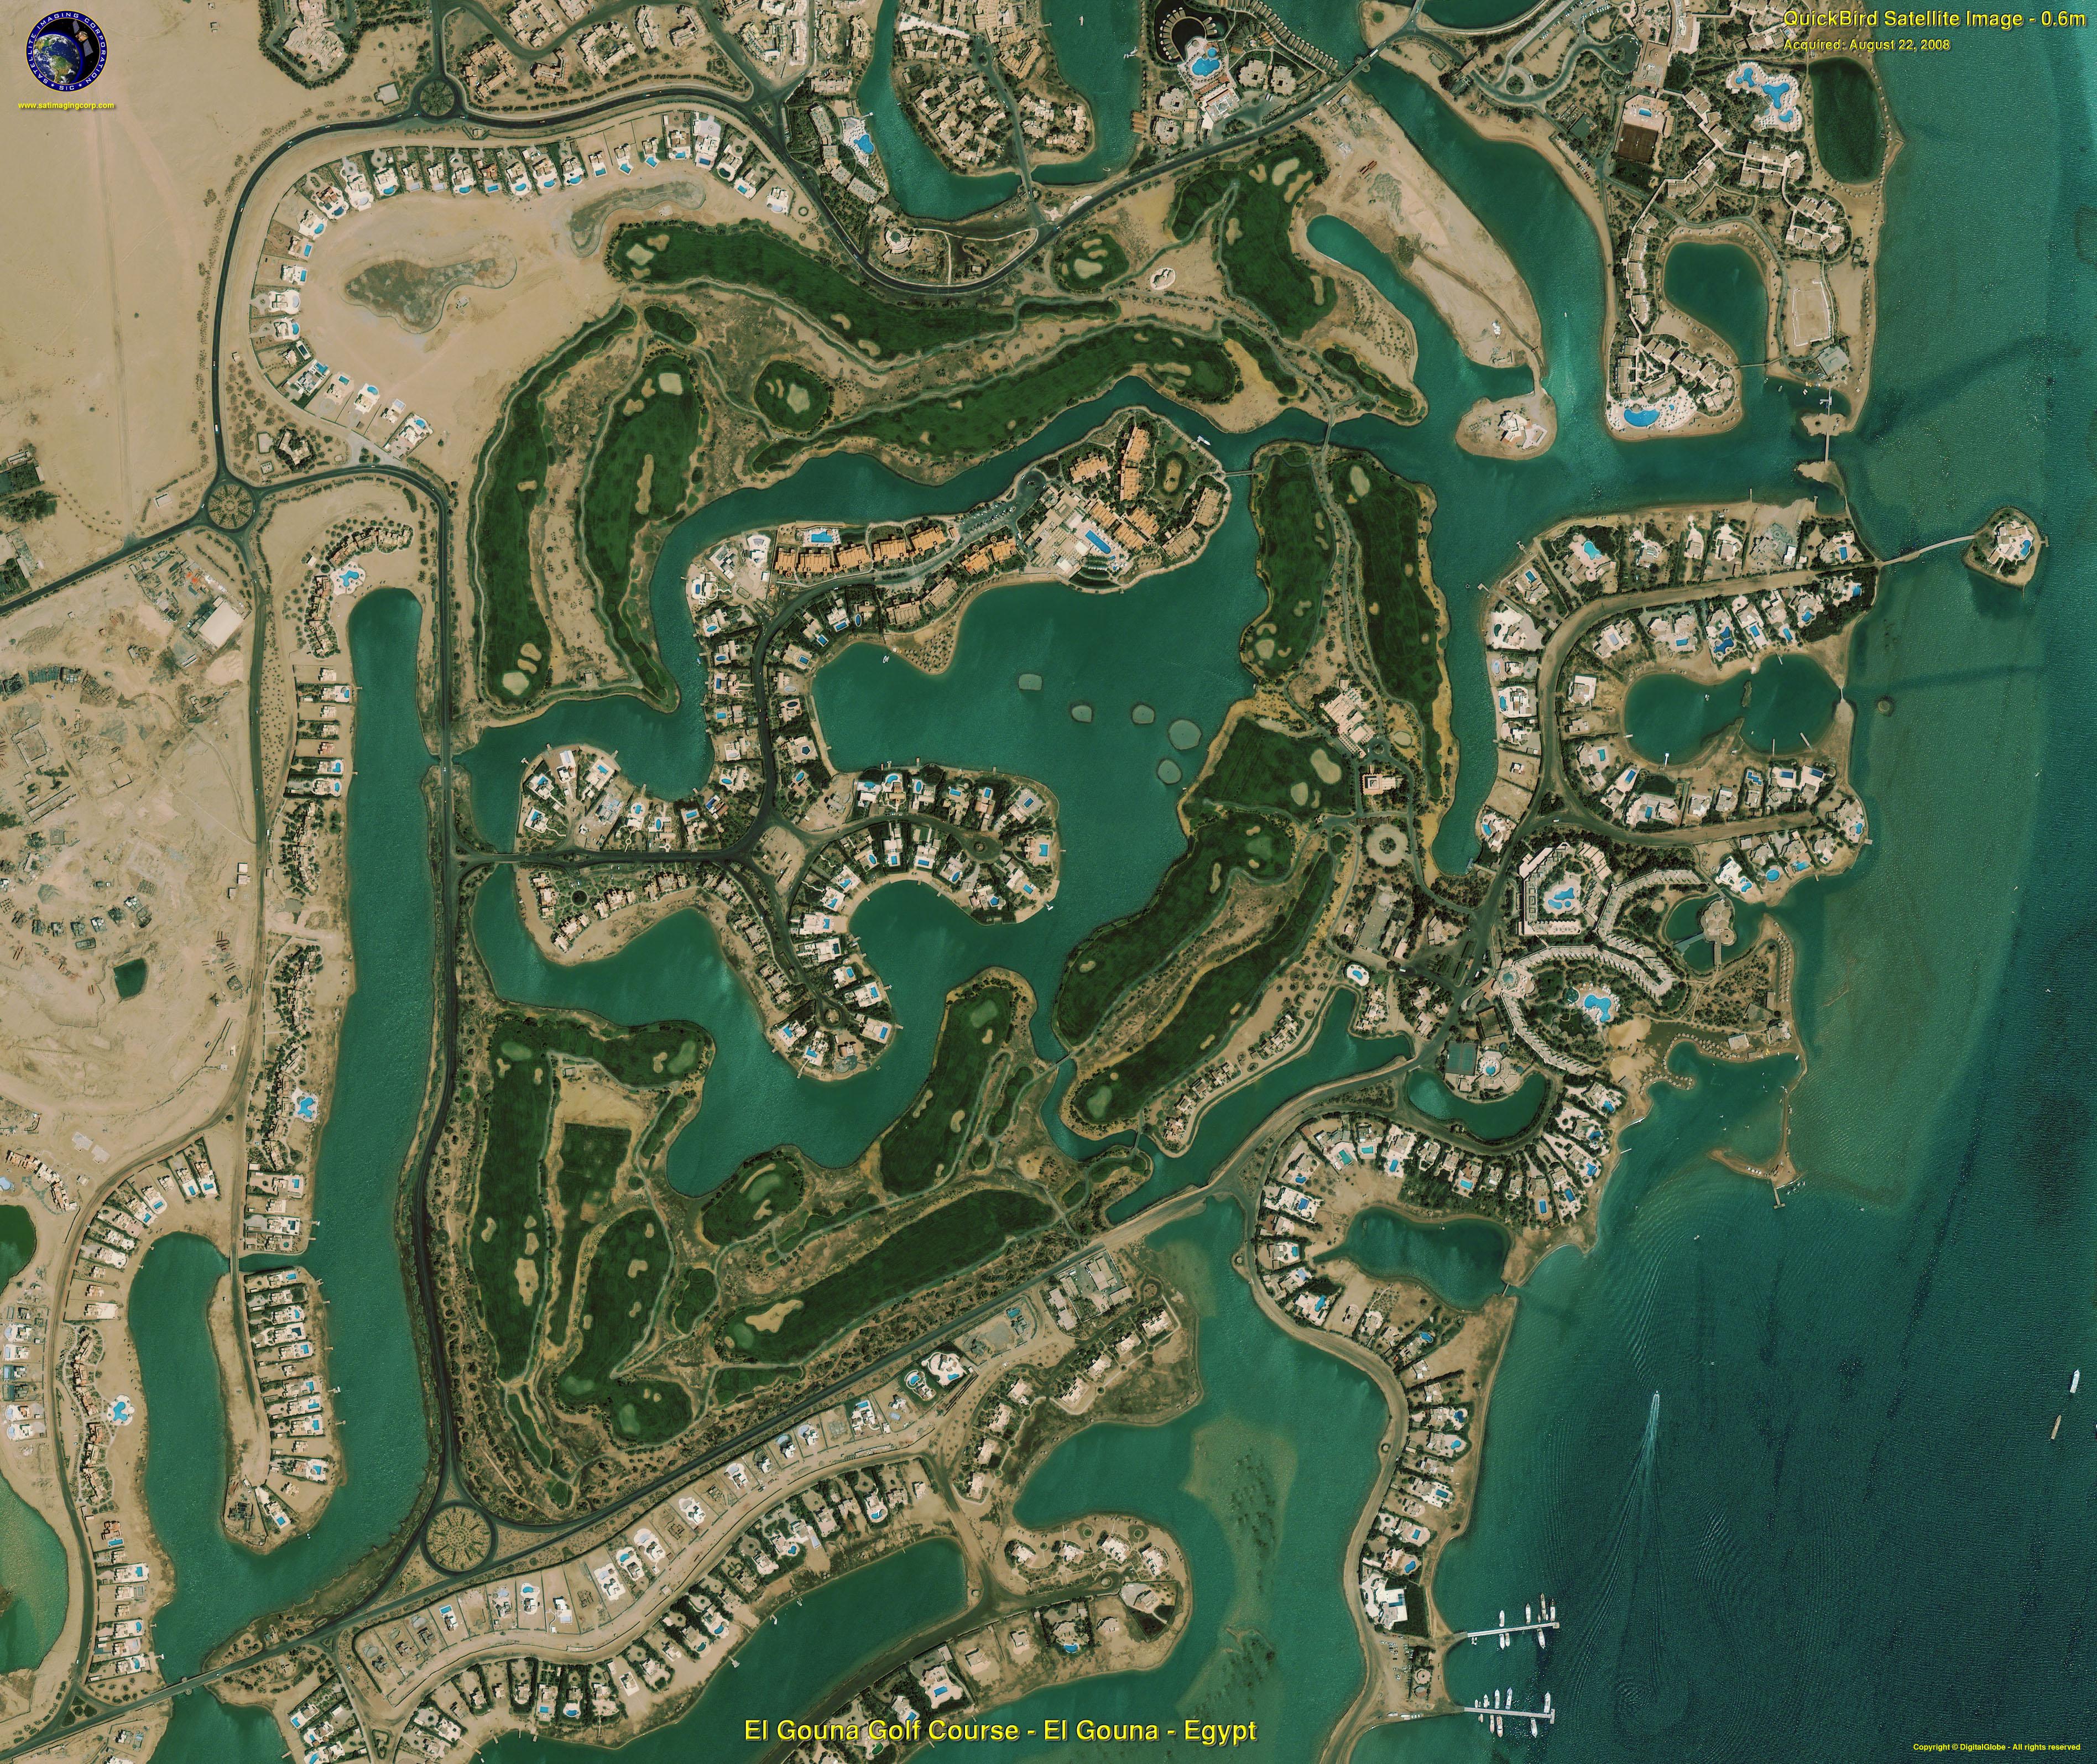 QuickBird Satellite Image Of El Gouna Golf Resort Satellite - Map of egypt el gouna